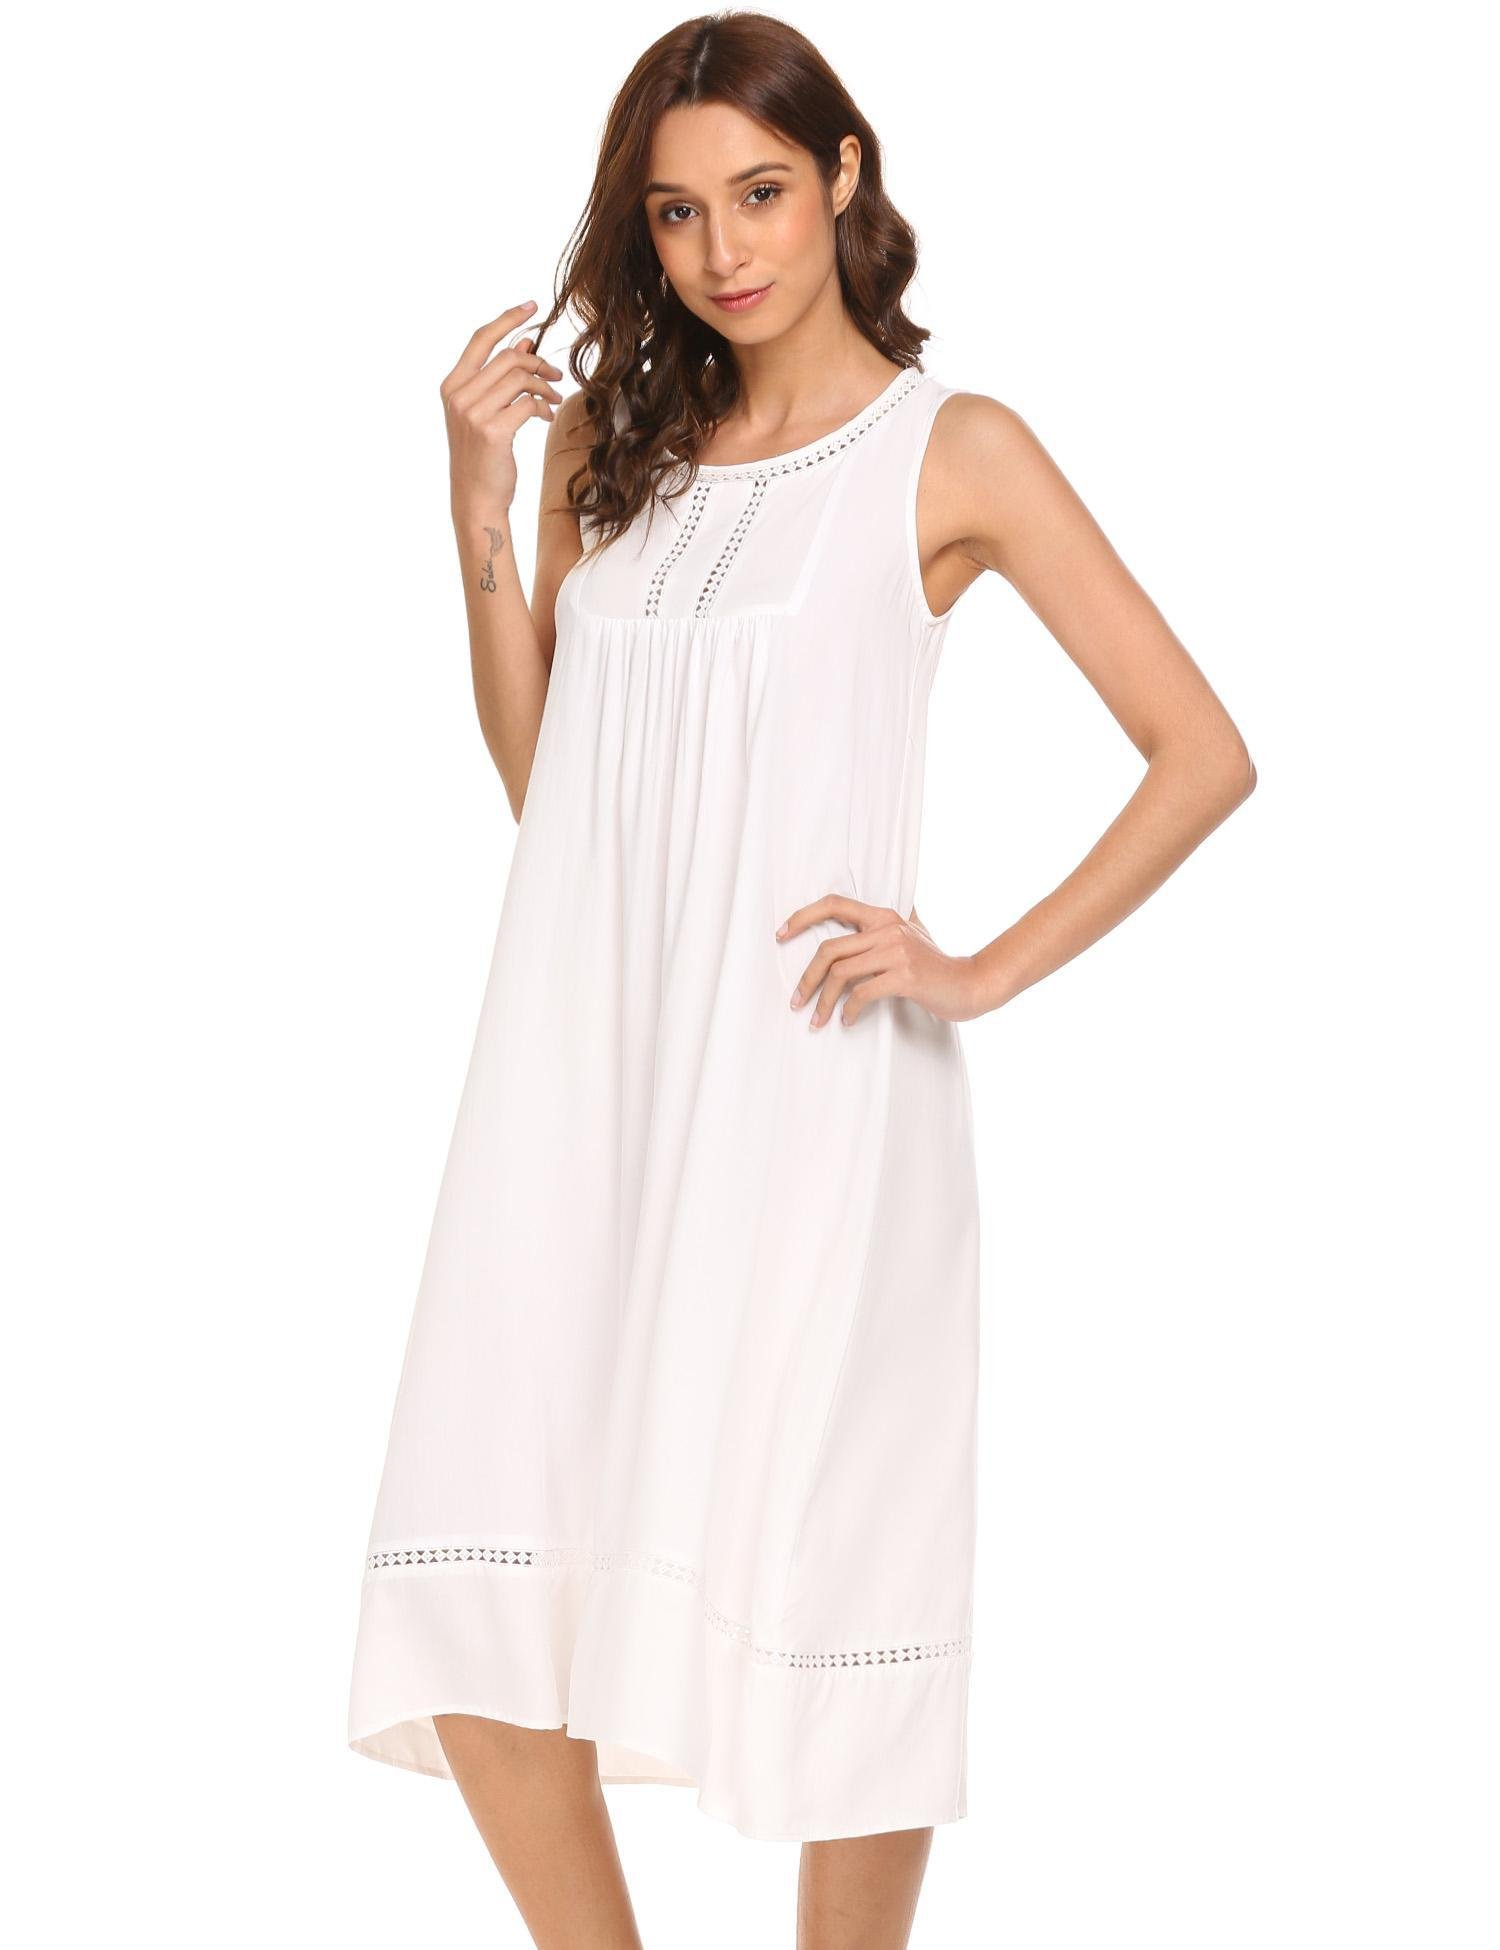 Langle Victorian Nightgowns Cotton Pajamas Women's Sleepwear Long Nighty (White, Medium)